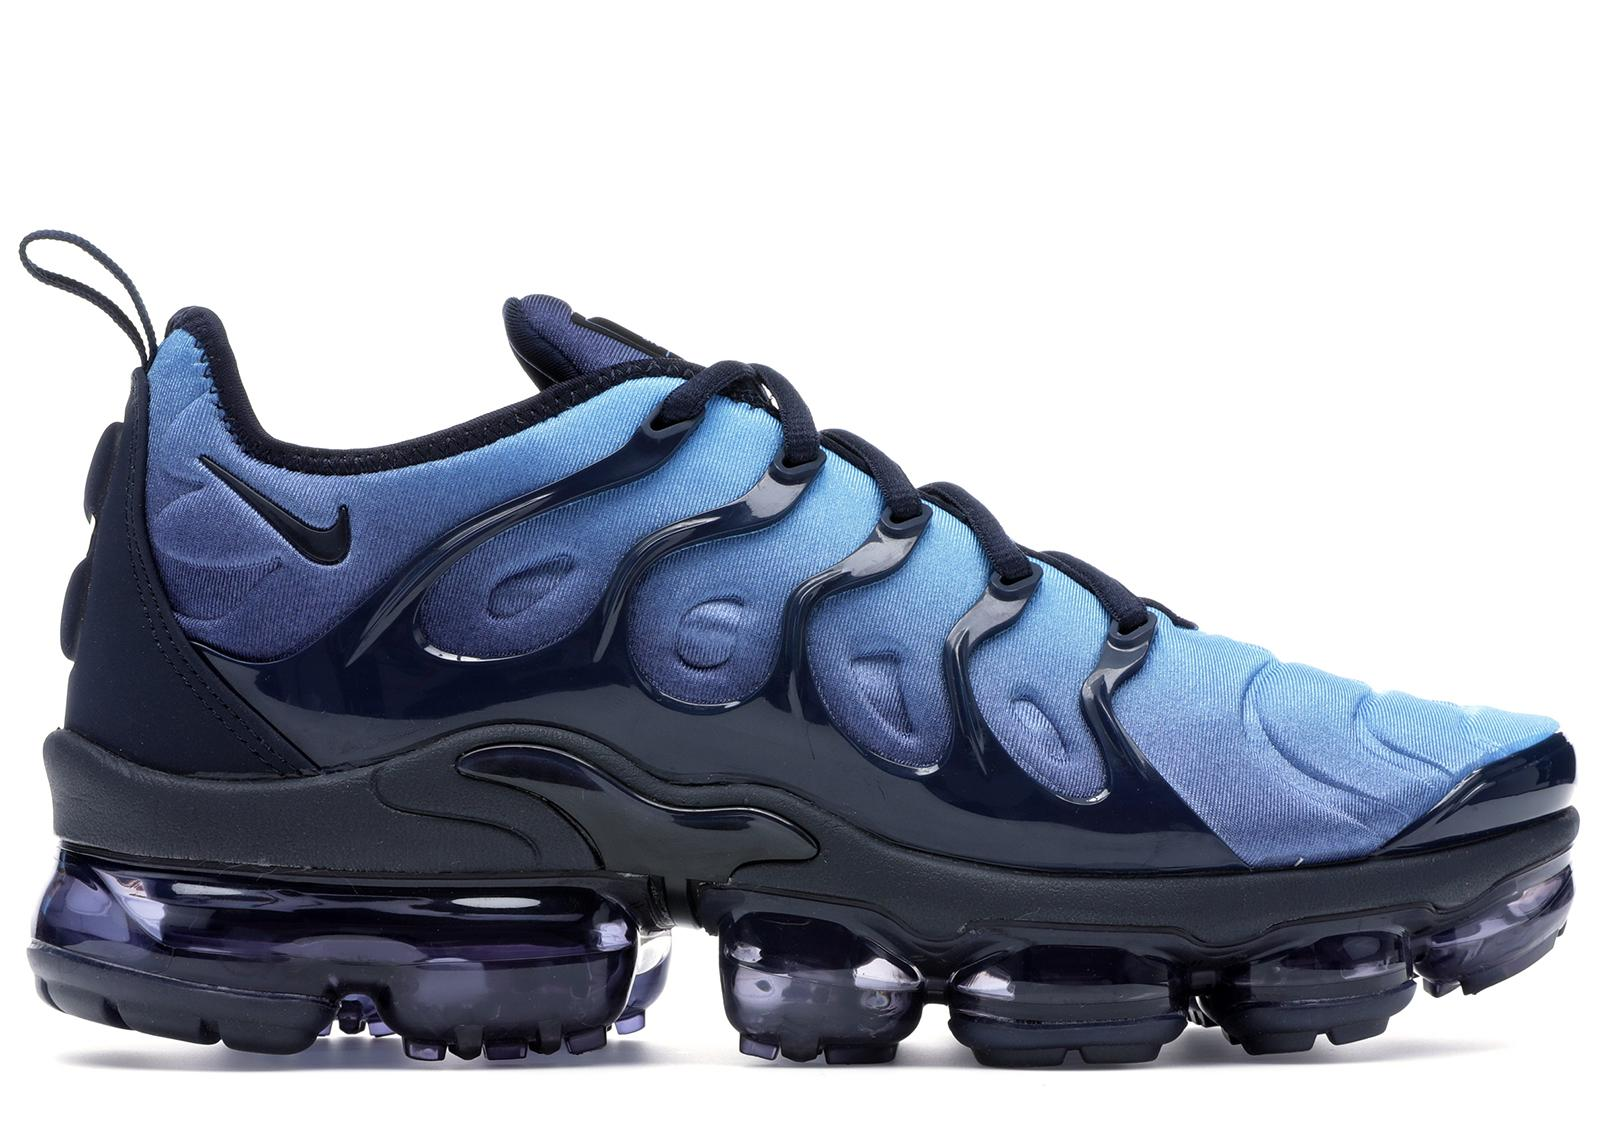 Nike Air Vapormax Plus Obsidian in Blue